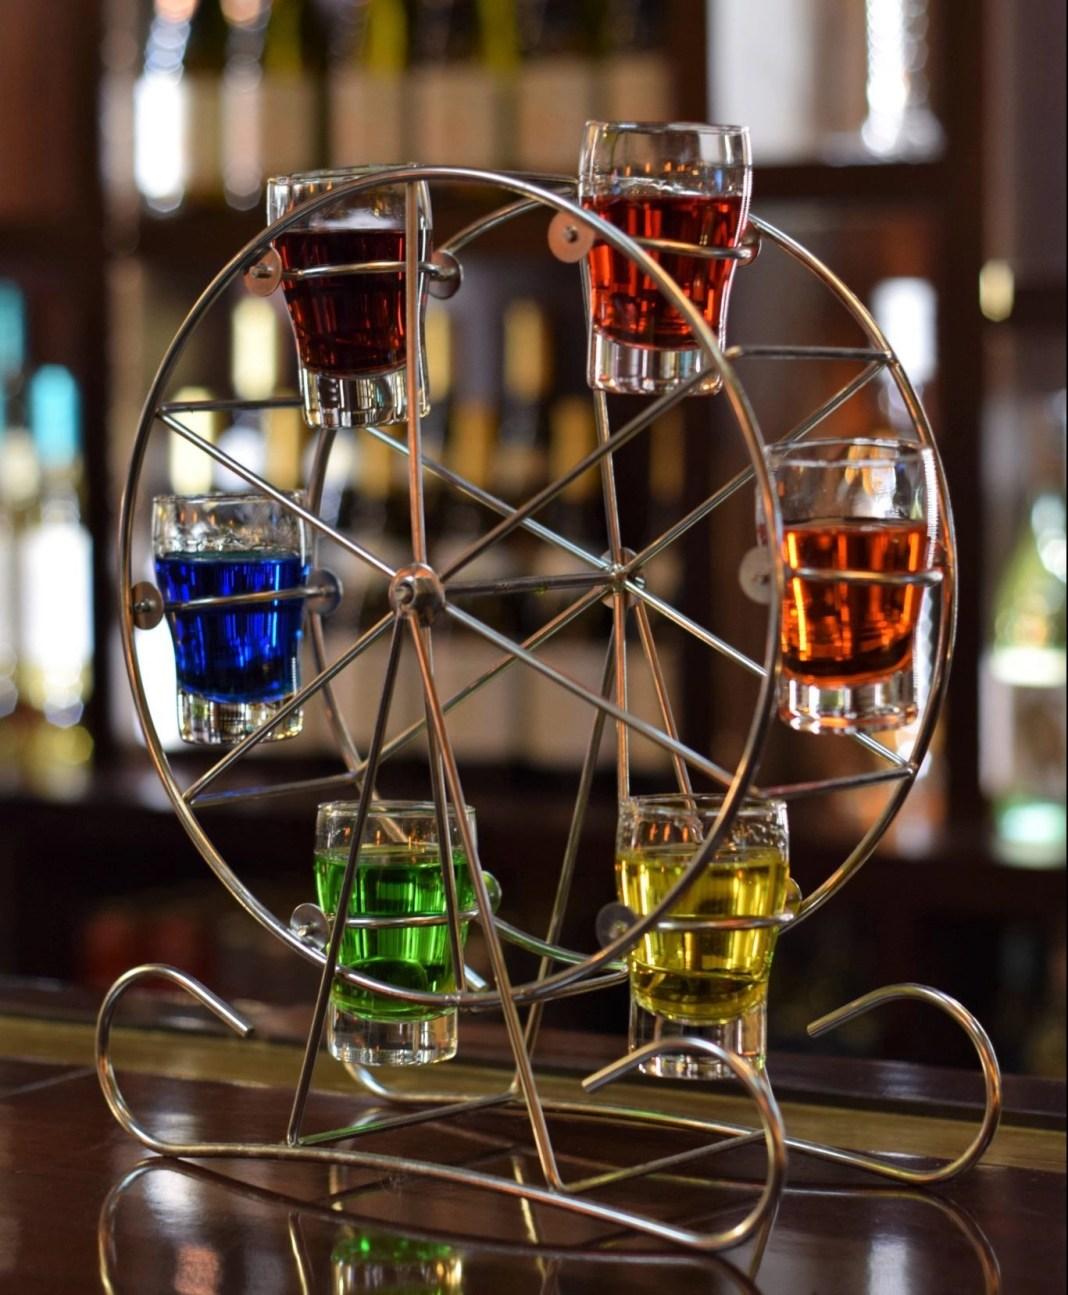 Rainbow Wheel of drinks